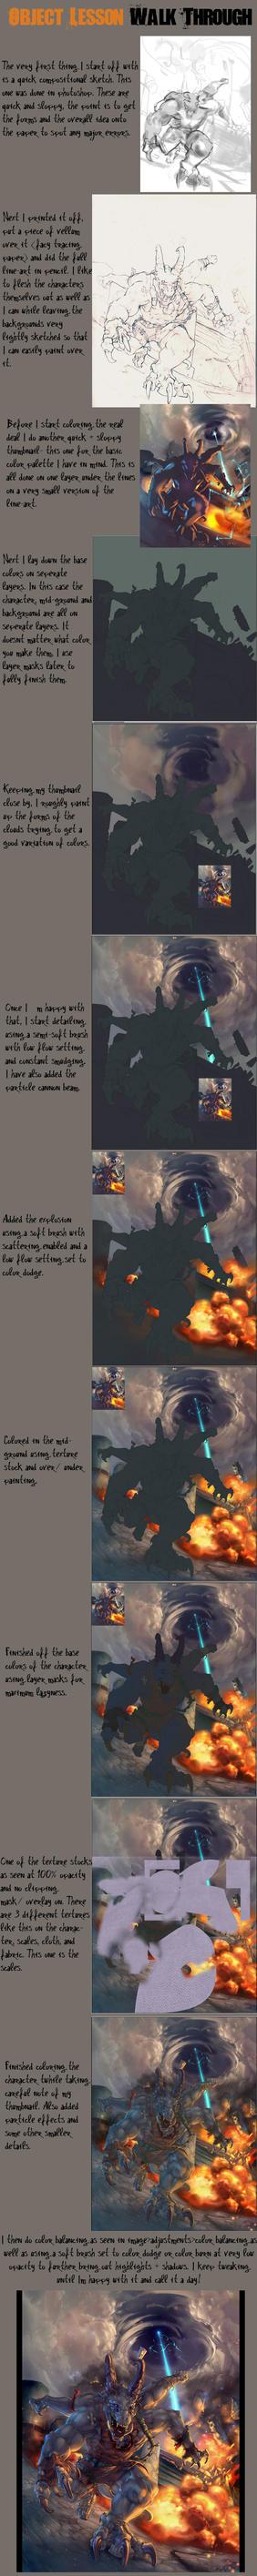 'Object Lesson' Walk Through by drak